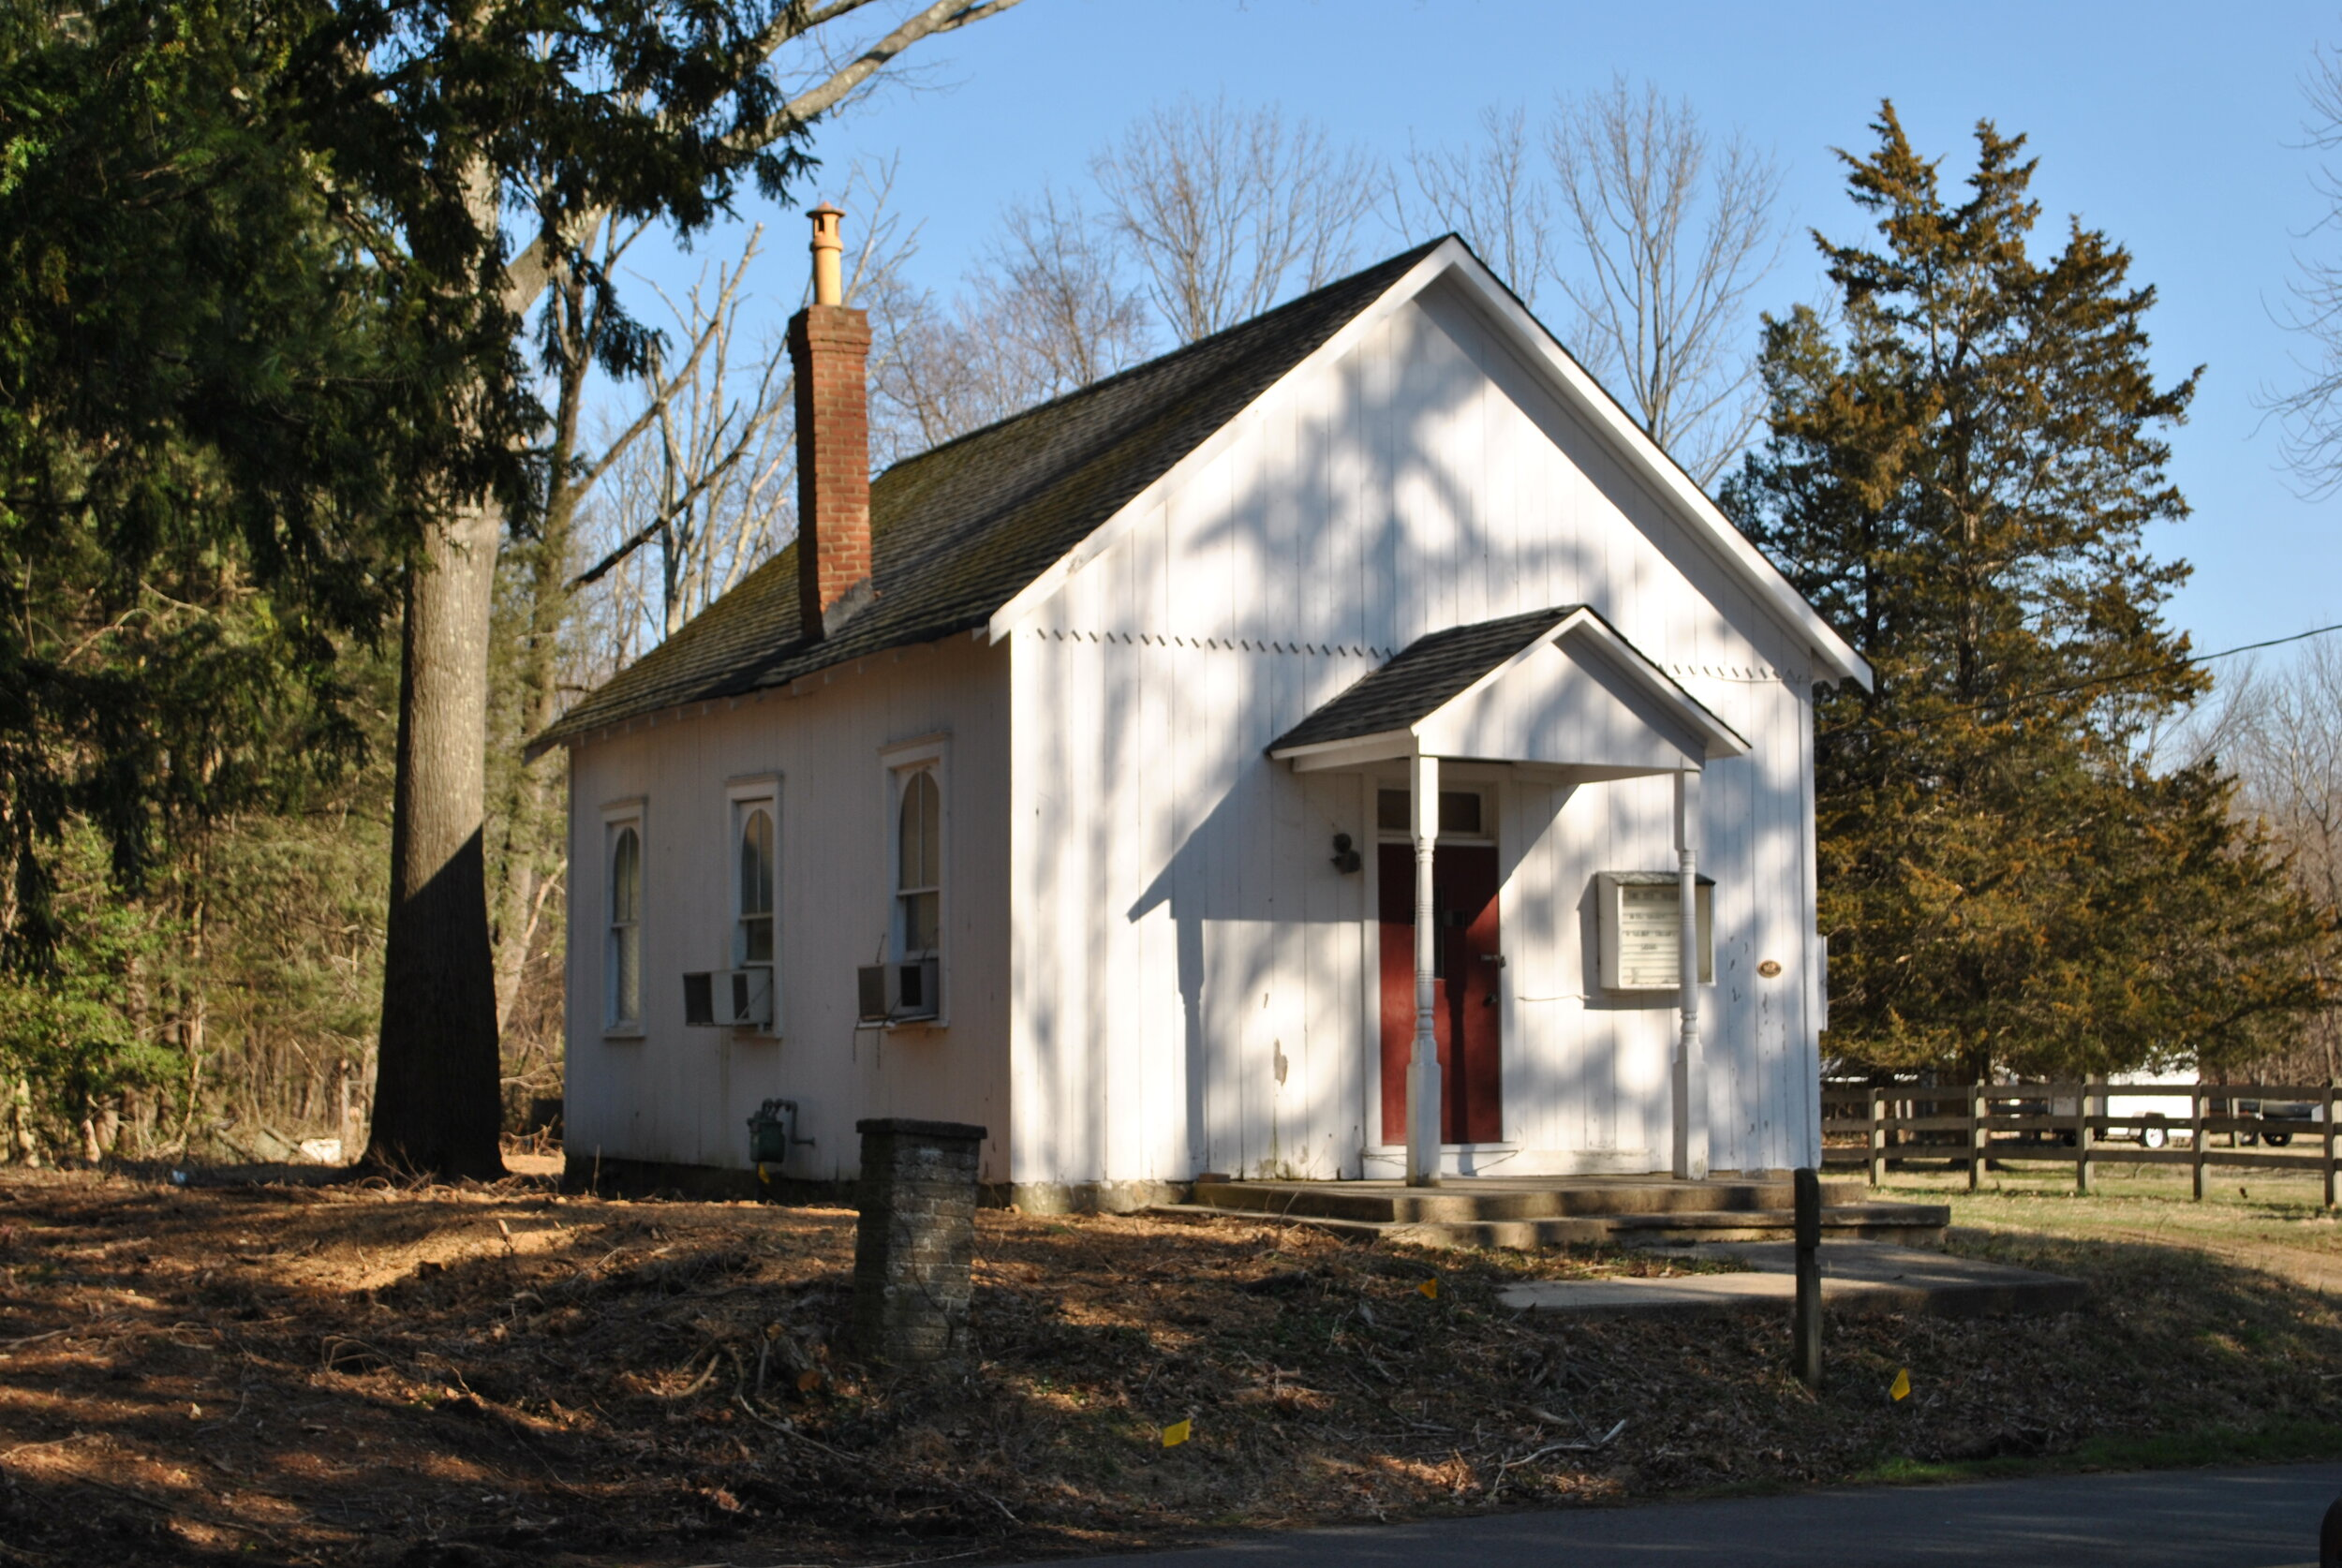 NJ_Somerset County_Mount Zion African Methodist Episcopal (AME) Church_0003.JPG